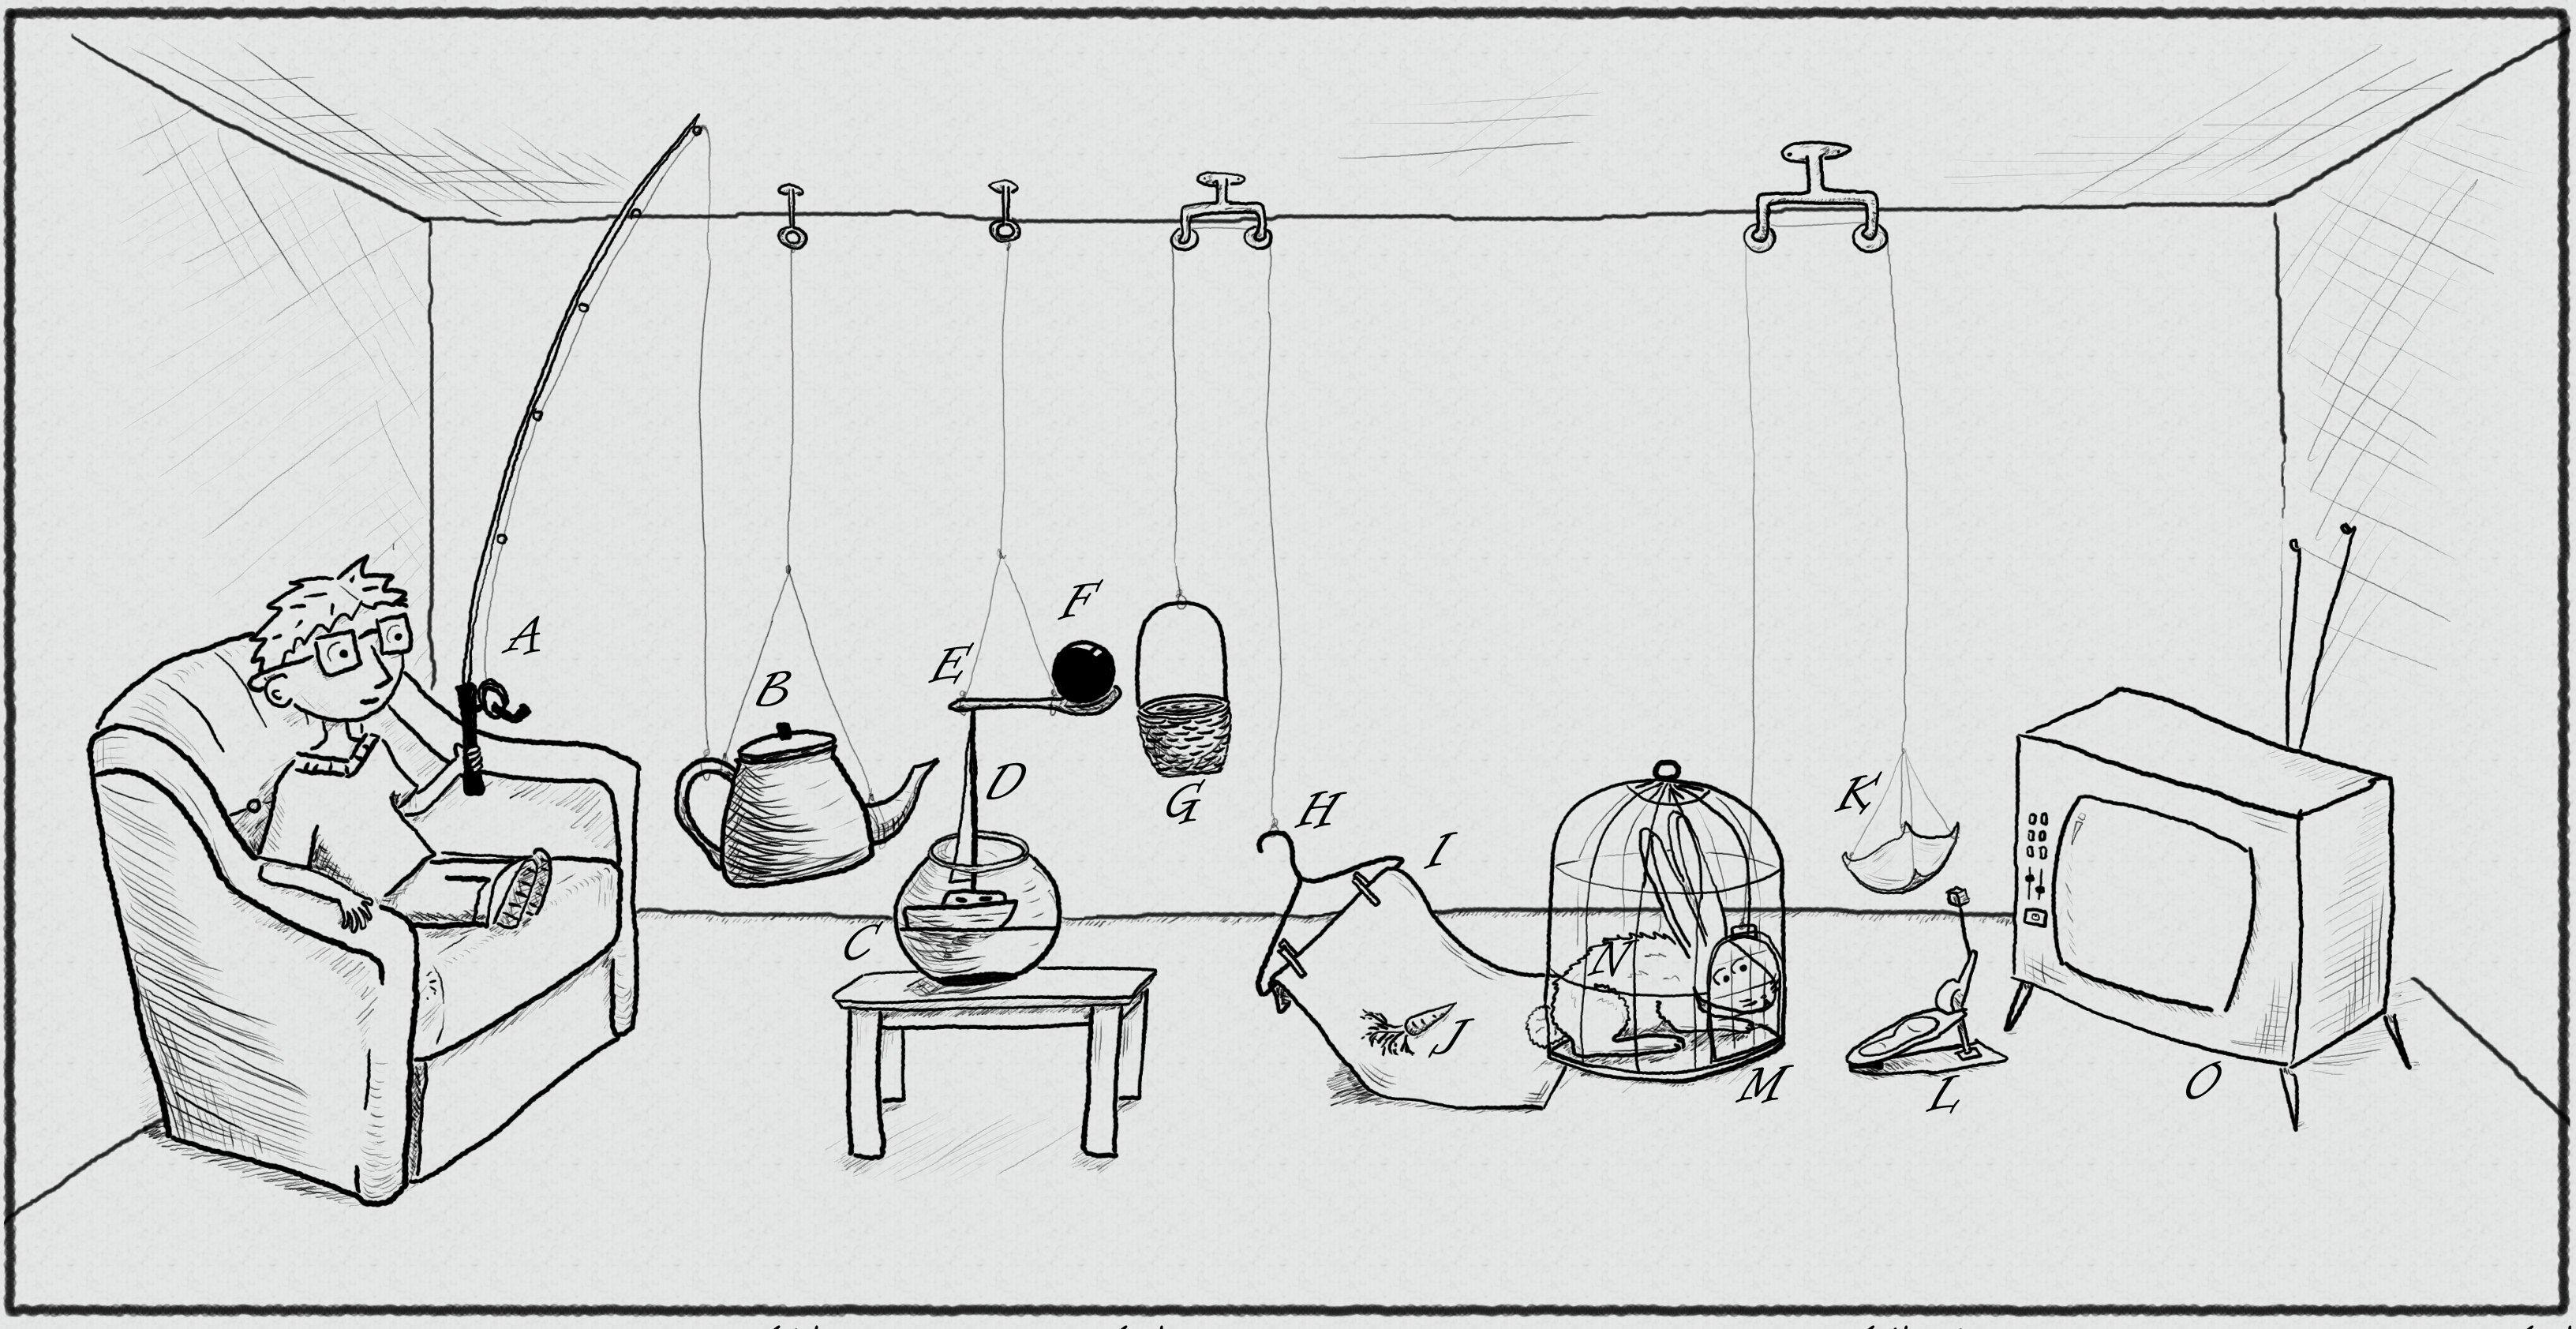 10 Fabulous Rube Goldberg Machine Ideas 10 Steps infosec the worlds largest rube goldberg device krypt3ia 2020